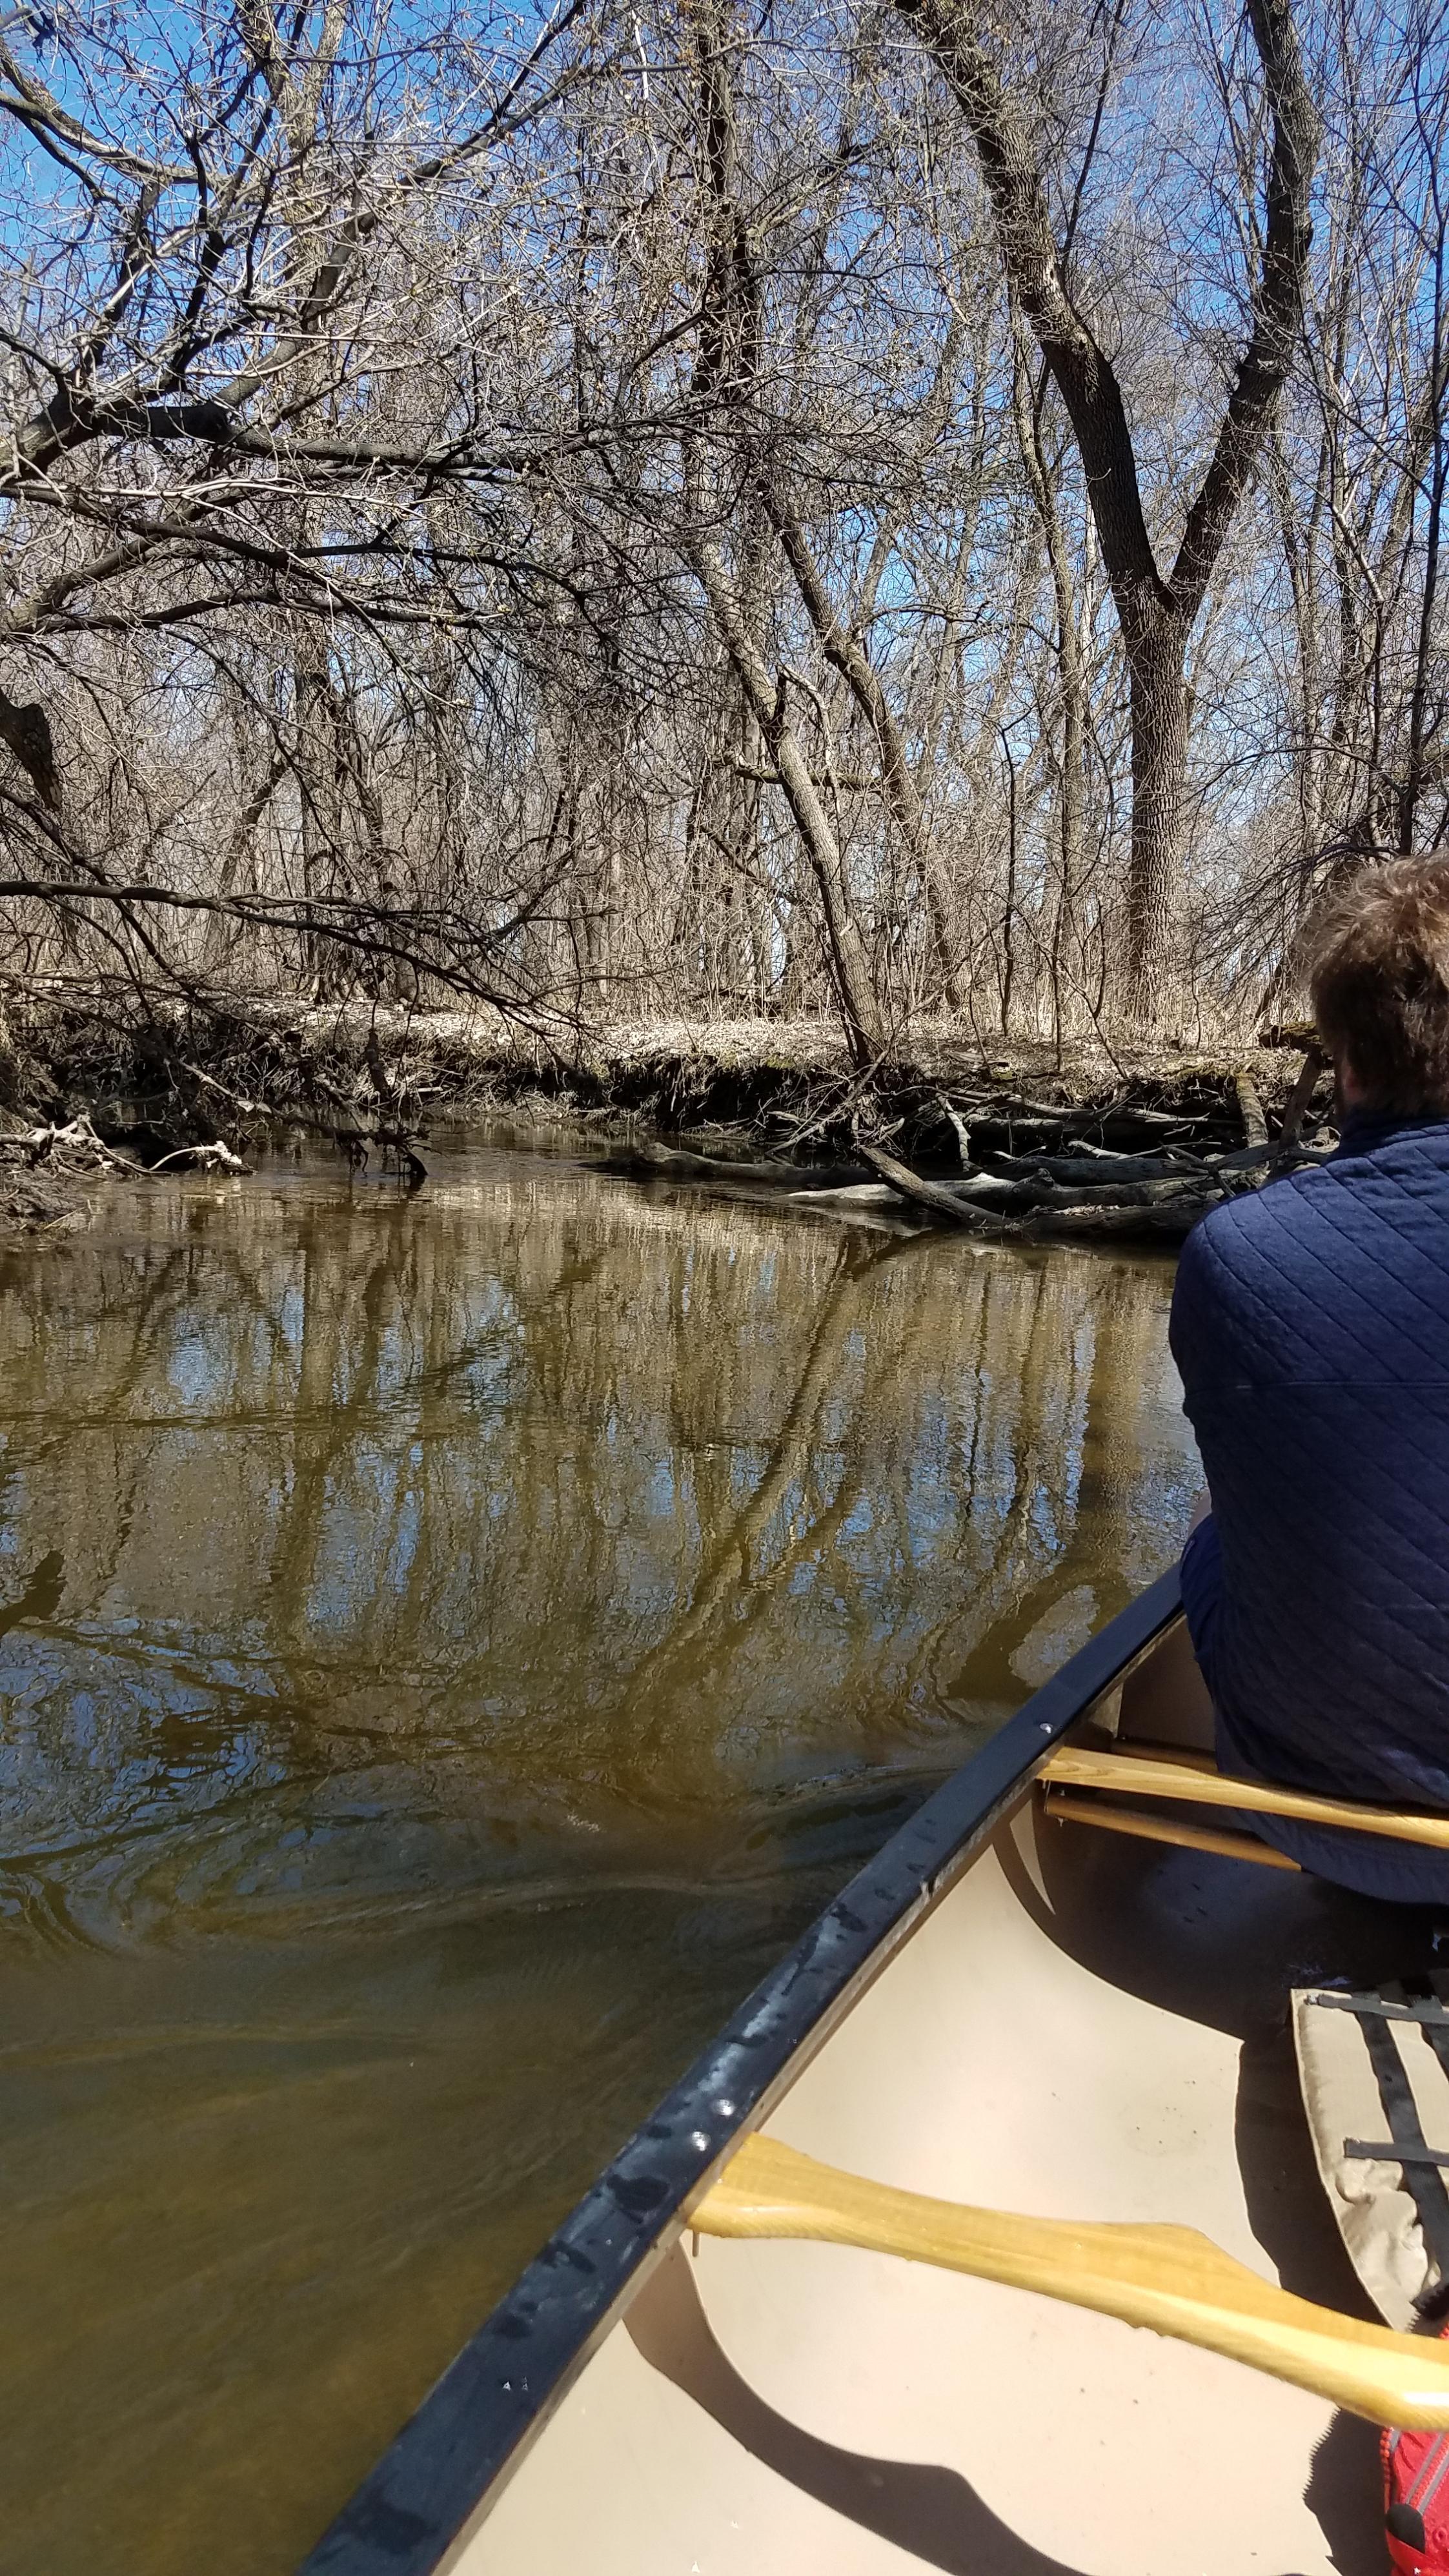 Pushing off into Elm Creek